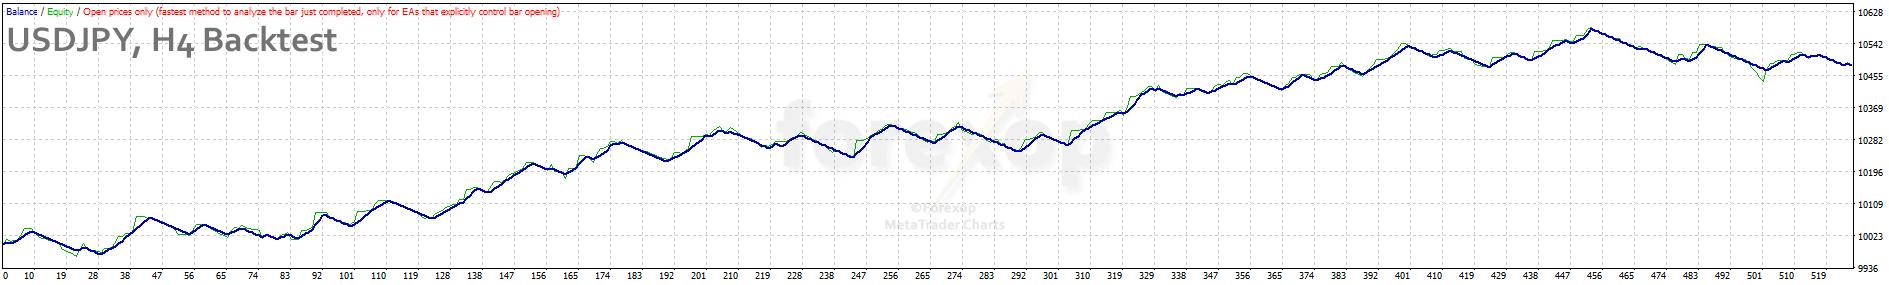 Figure 6: USDJPY, four hour chart back test